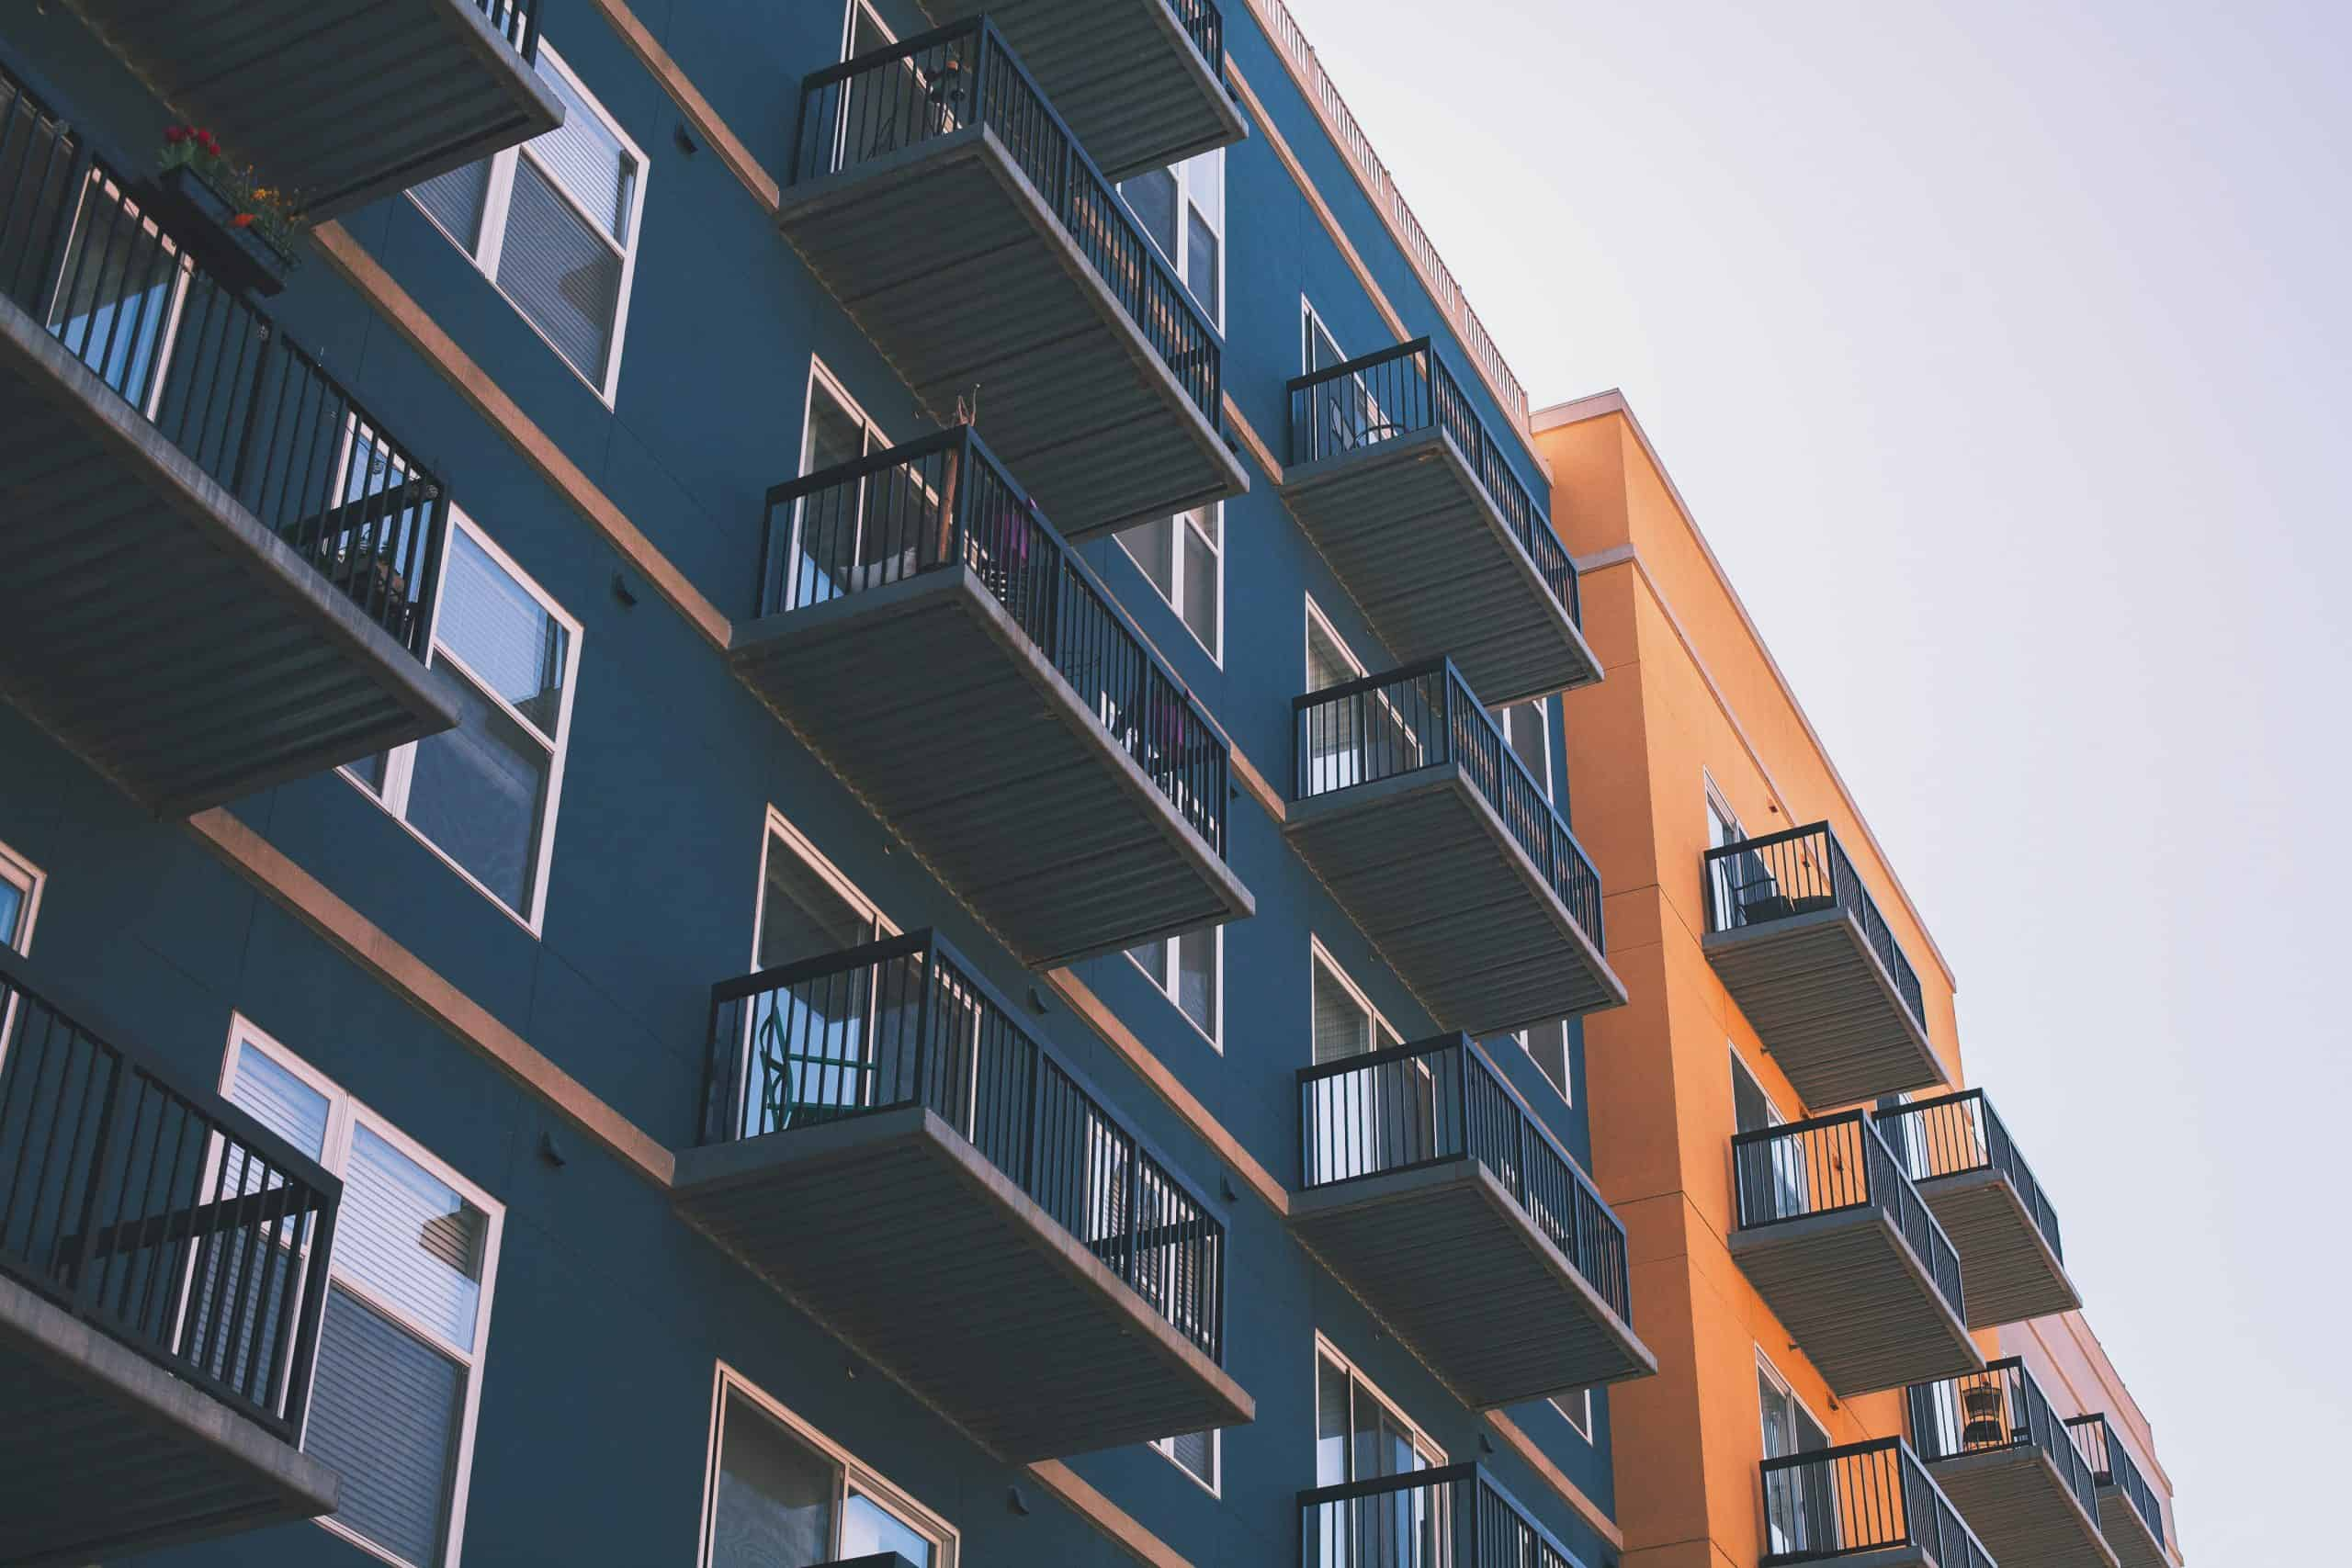 Is a studio apartment worth it?